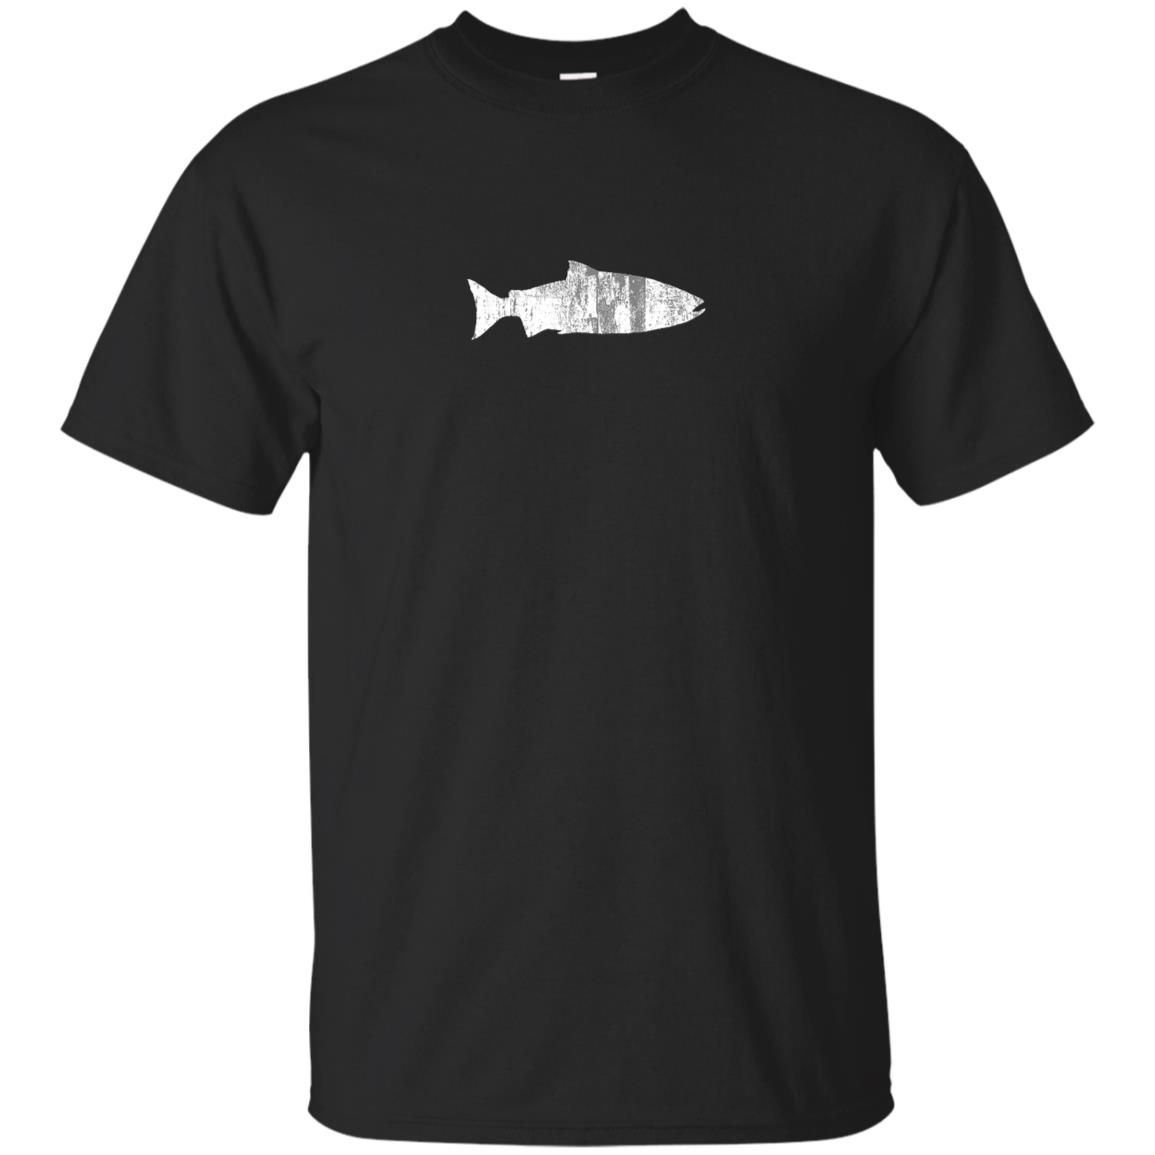 Fish Salmon – – Distressed Vintage Retro Unisex Short Sleeve